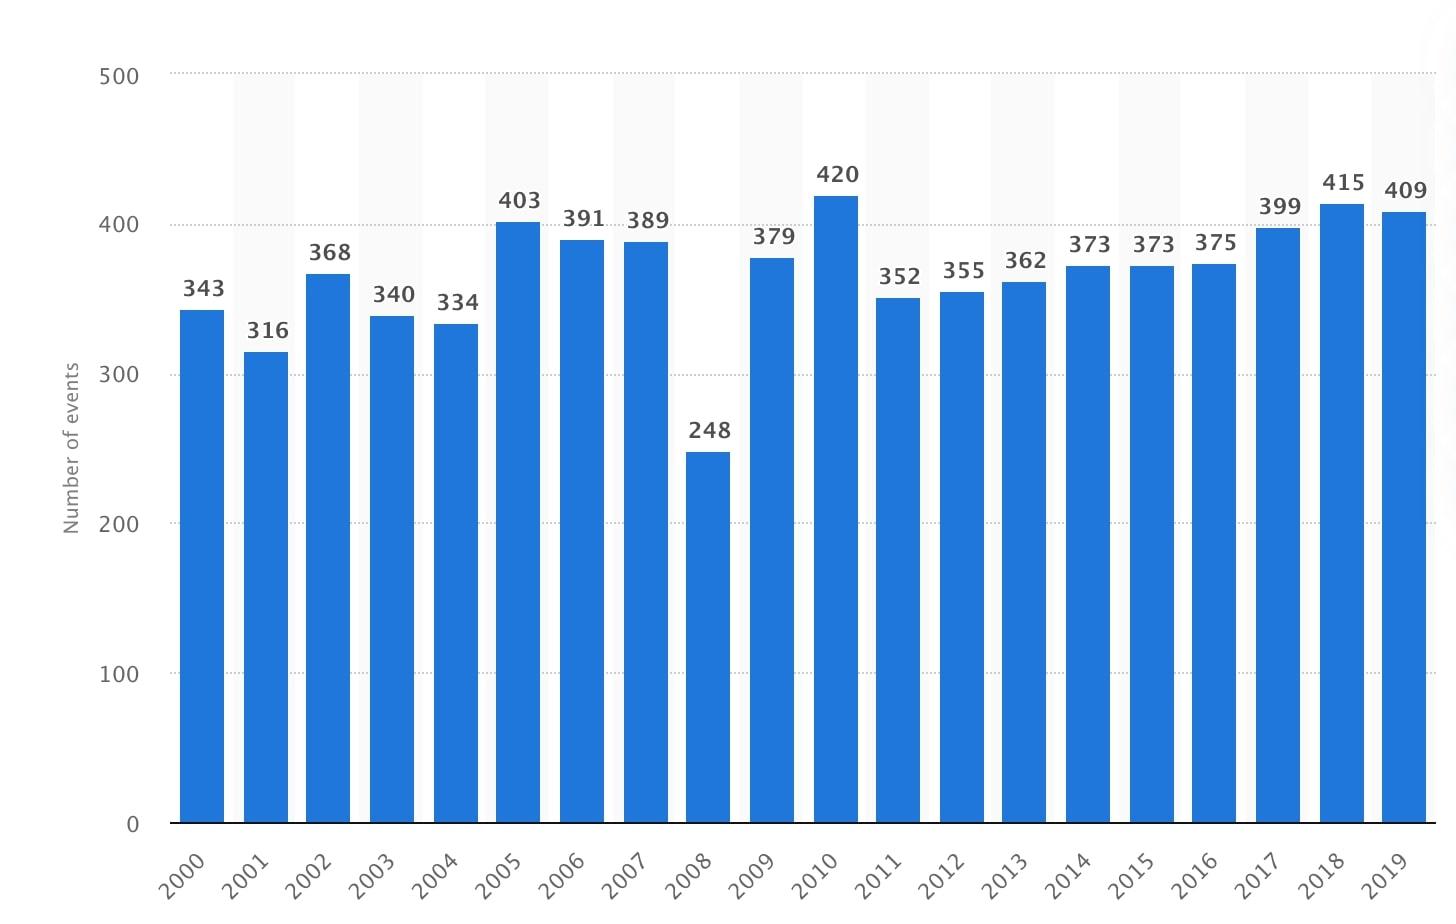 number of natural disasters per year